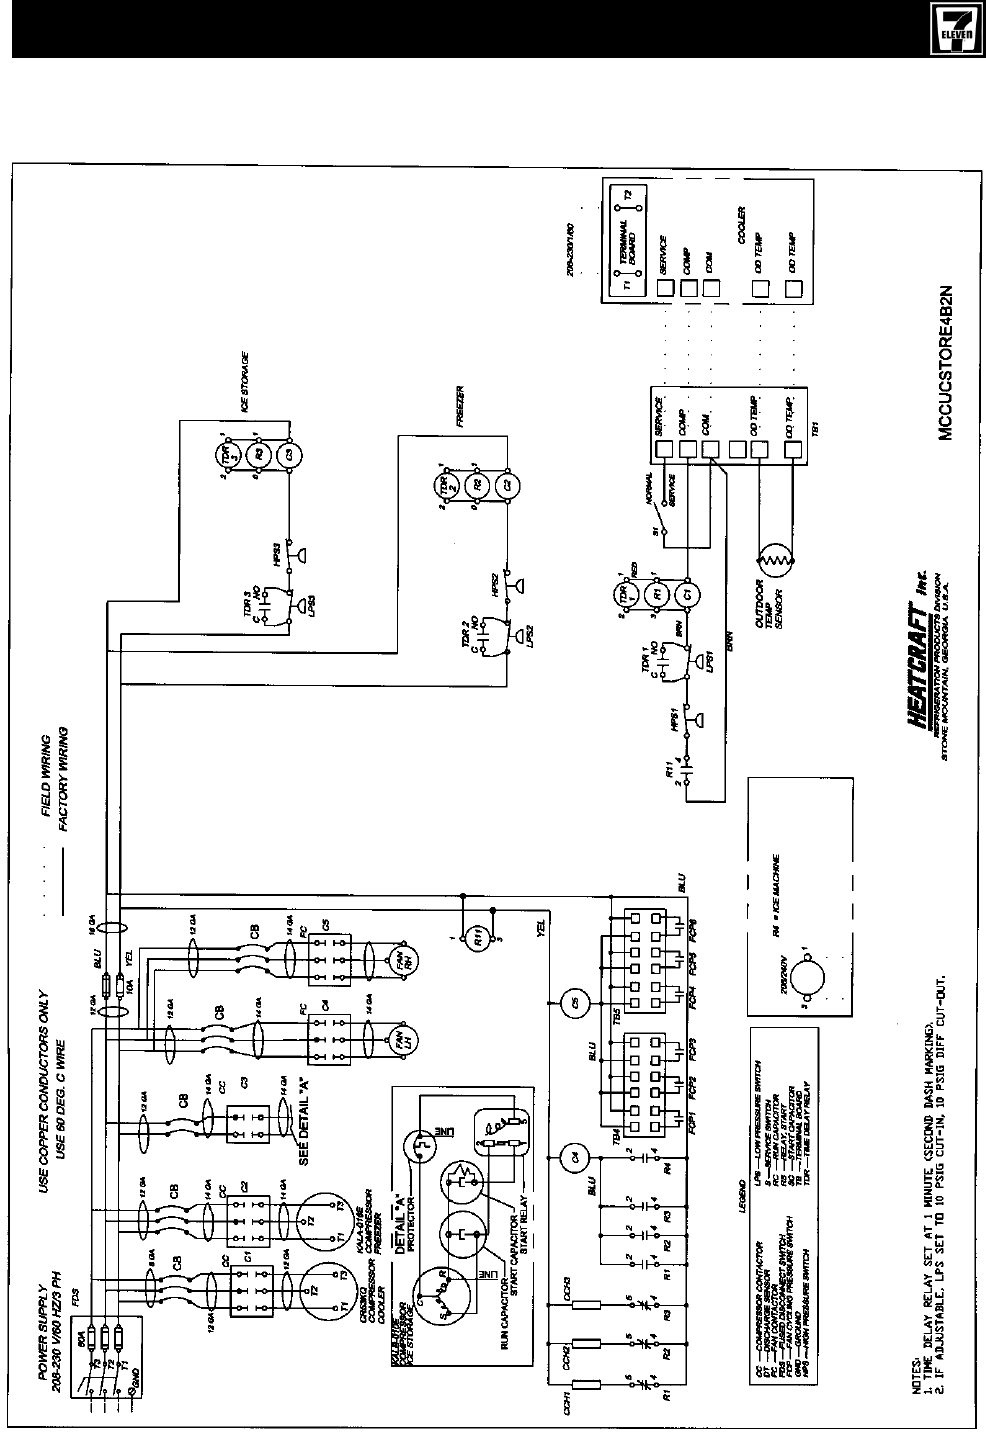 medium resolution of heatcraft refrigeration products ii users manual h im 711c5 pm6 5heatcraft evaporator coil wiring diagram